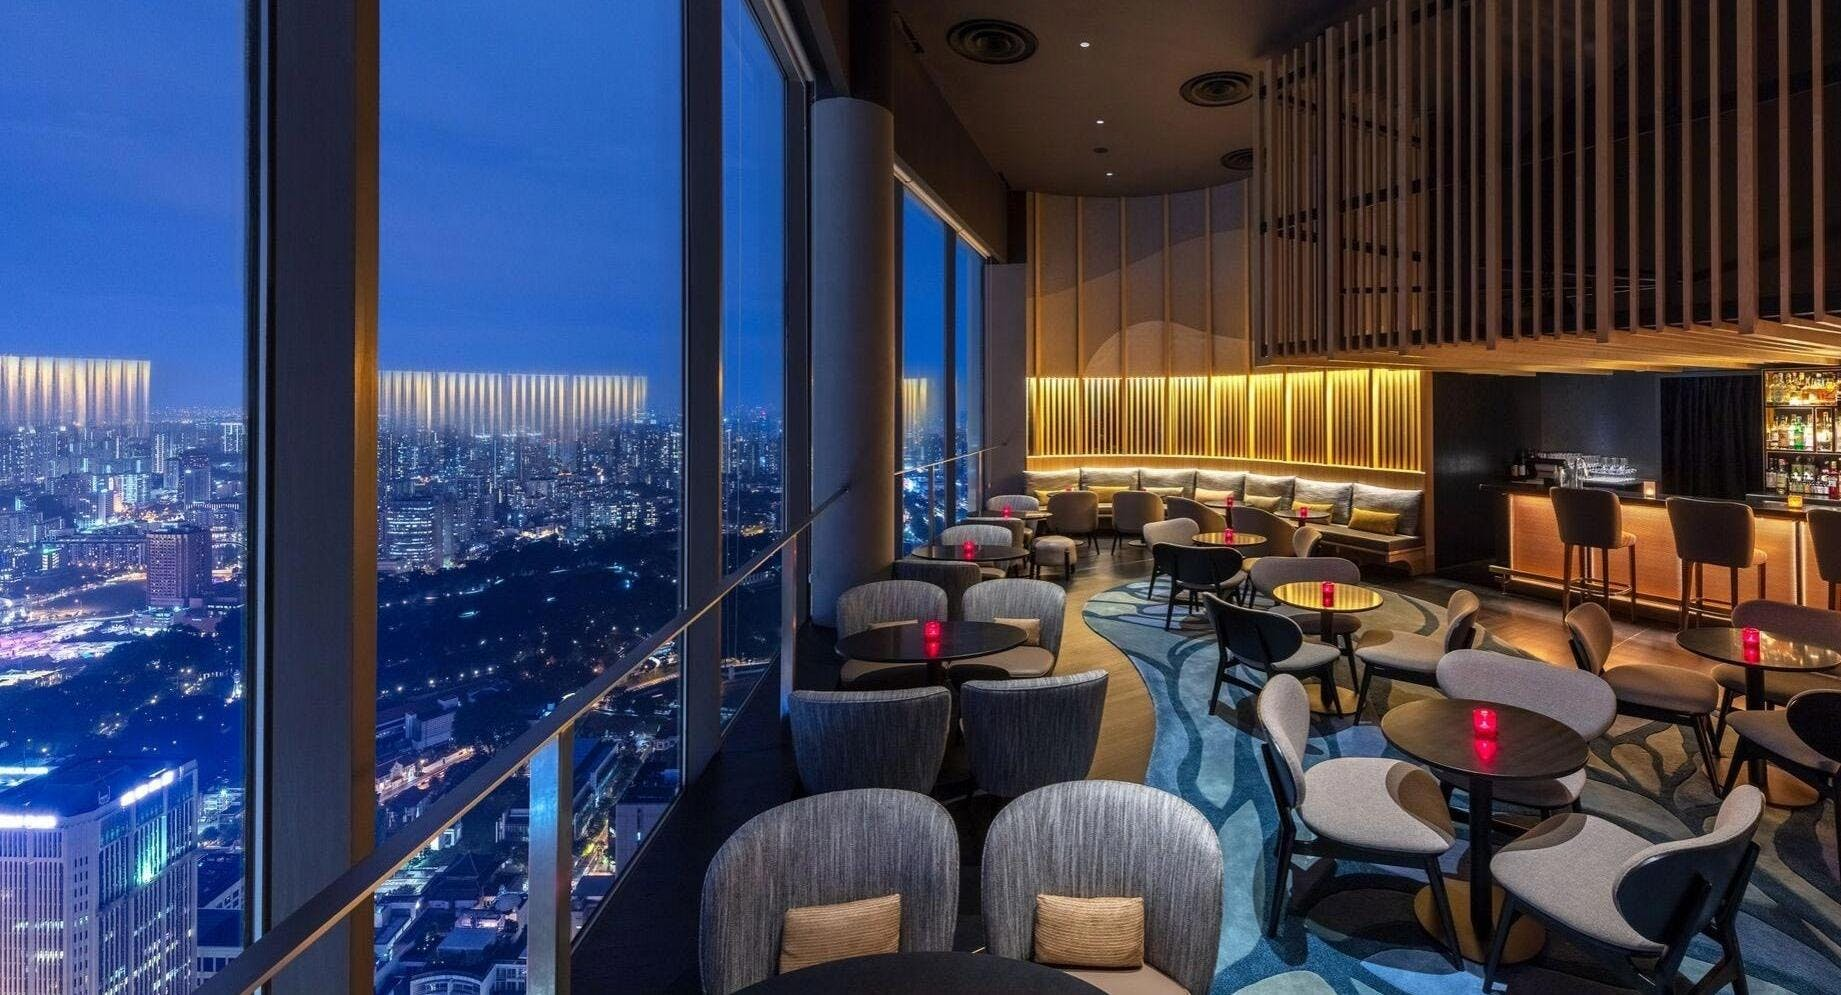 Photo of restaurant SKAI Bar in City Hall, Singapore